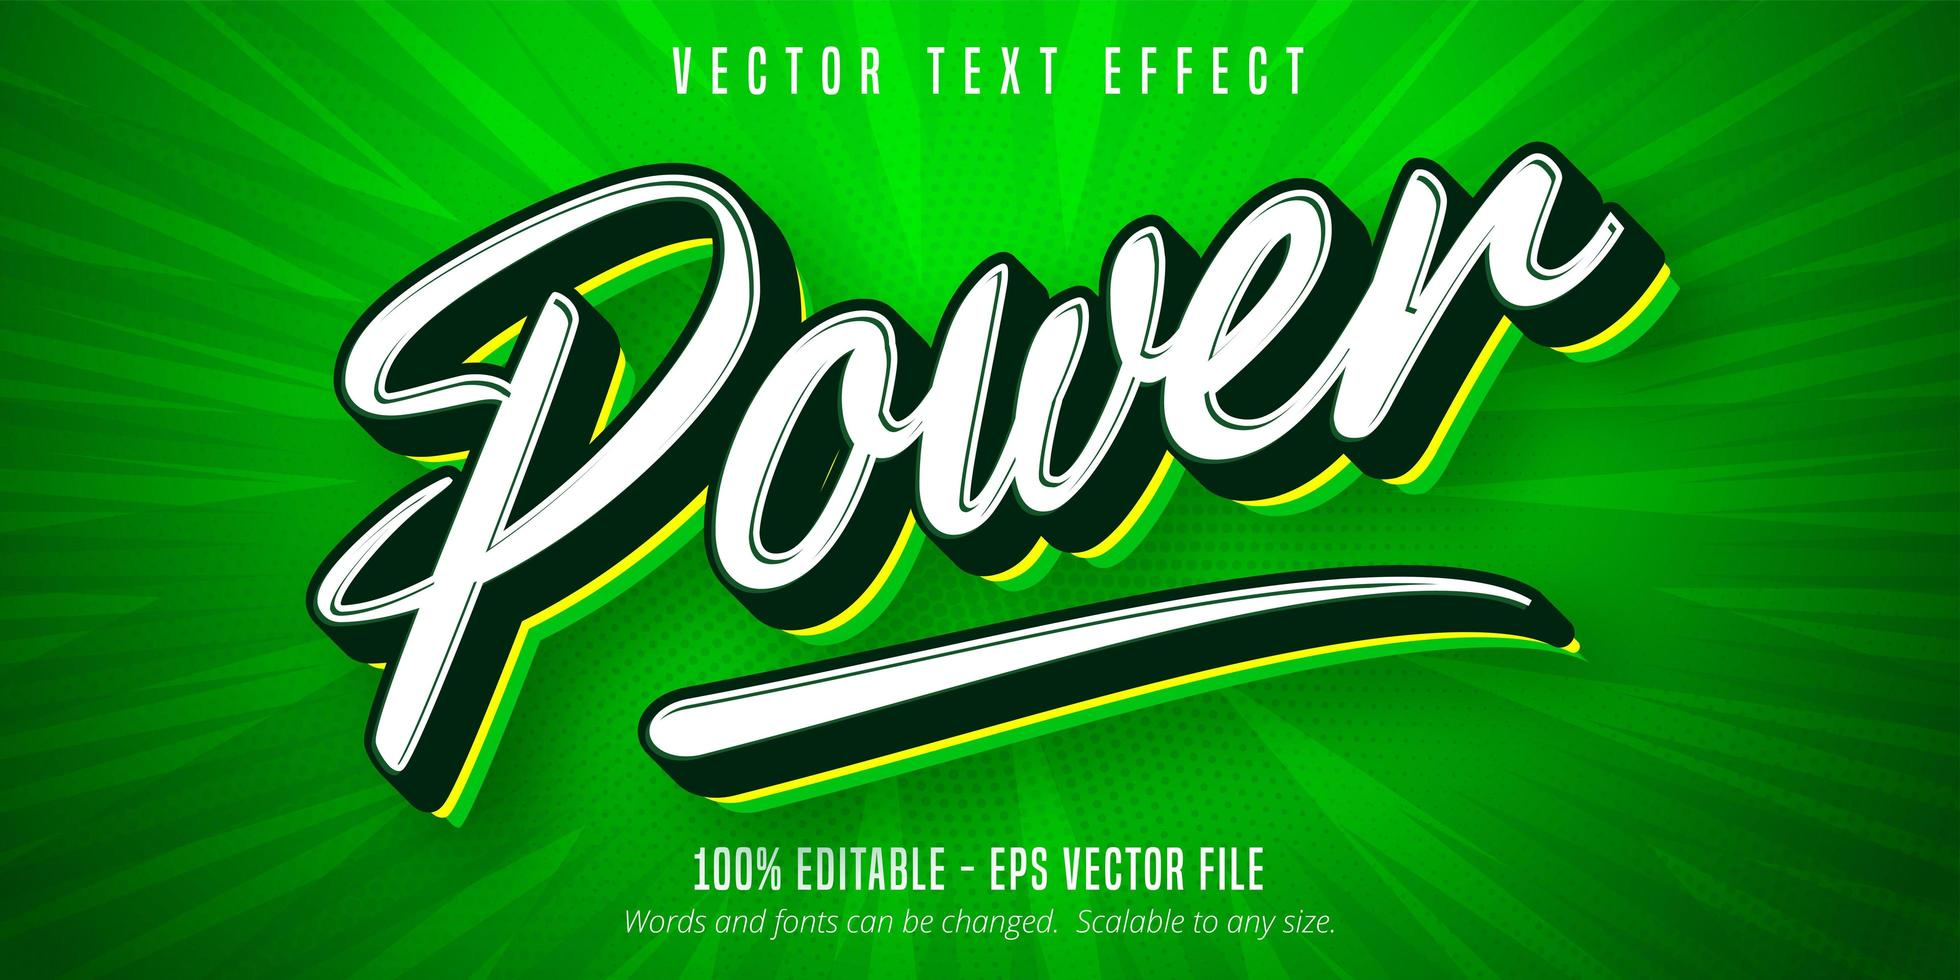 power text, script stil text effekt vektor